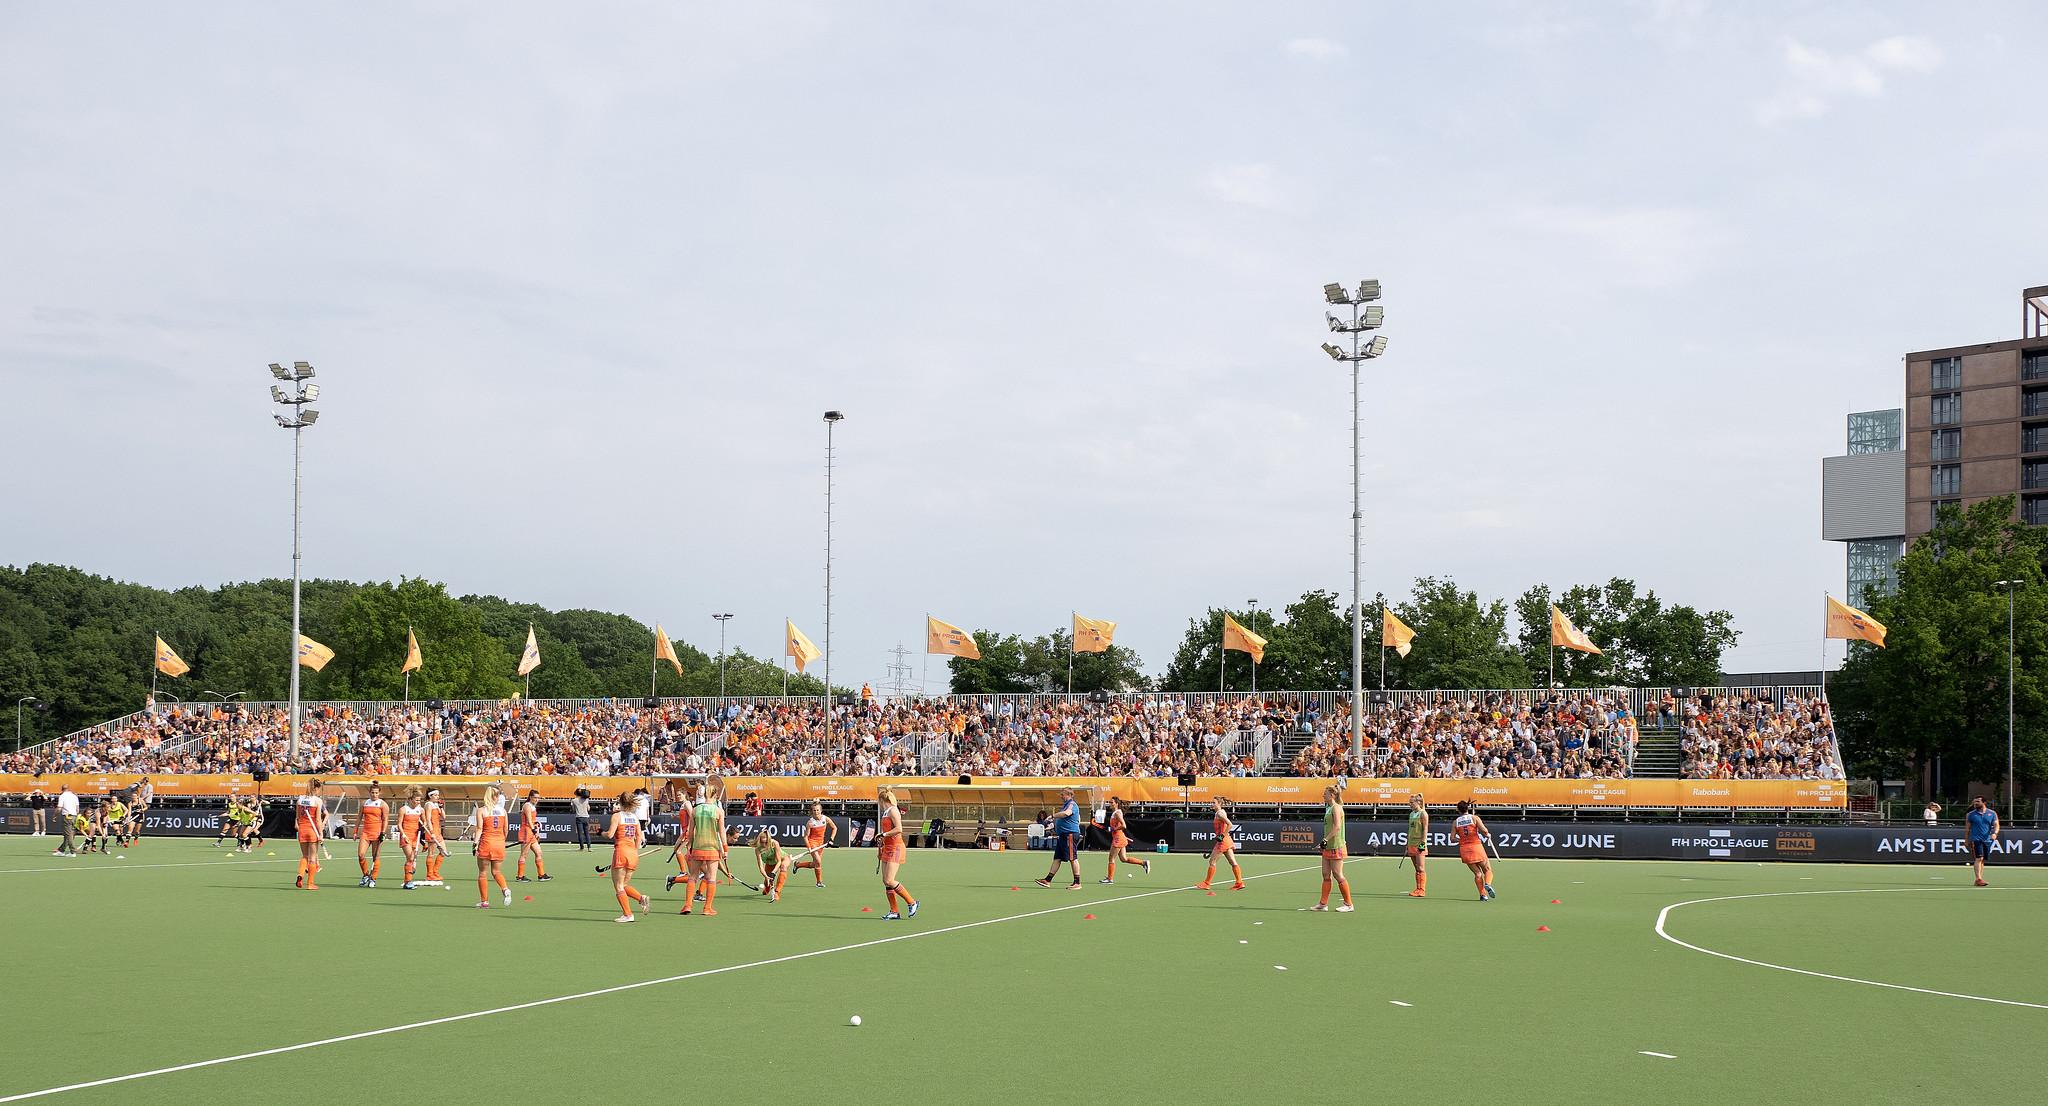 Preview Pro League (D): Nederlands dameselftal wacht dubbele ontmoeting met België